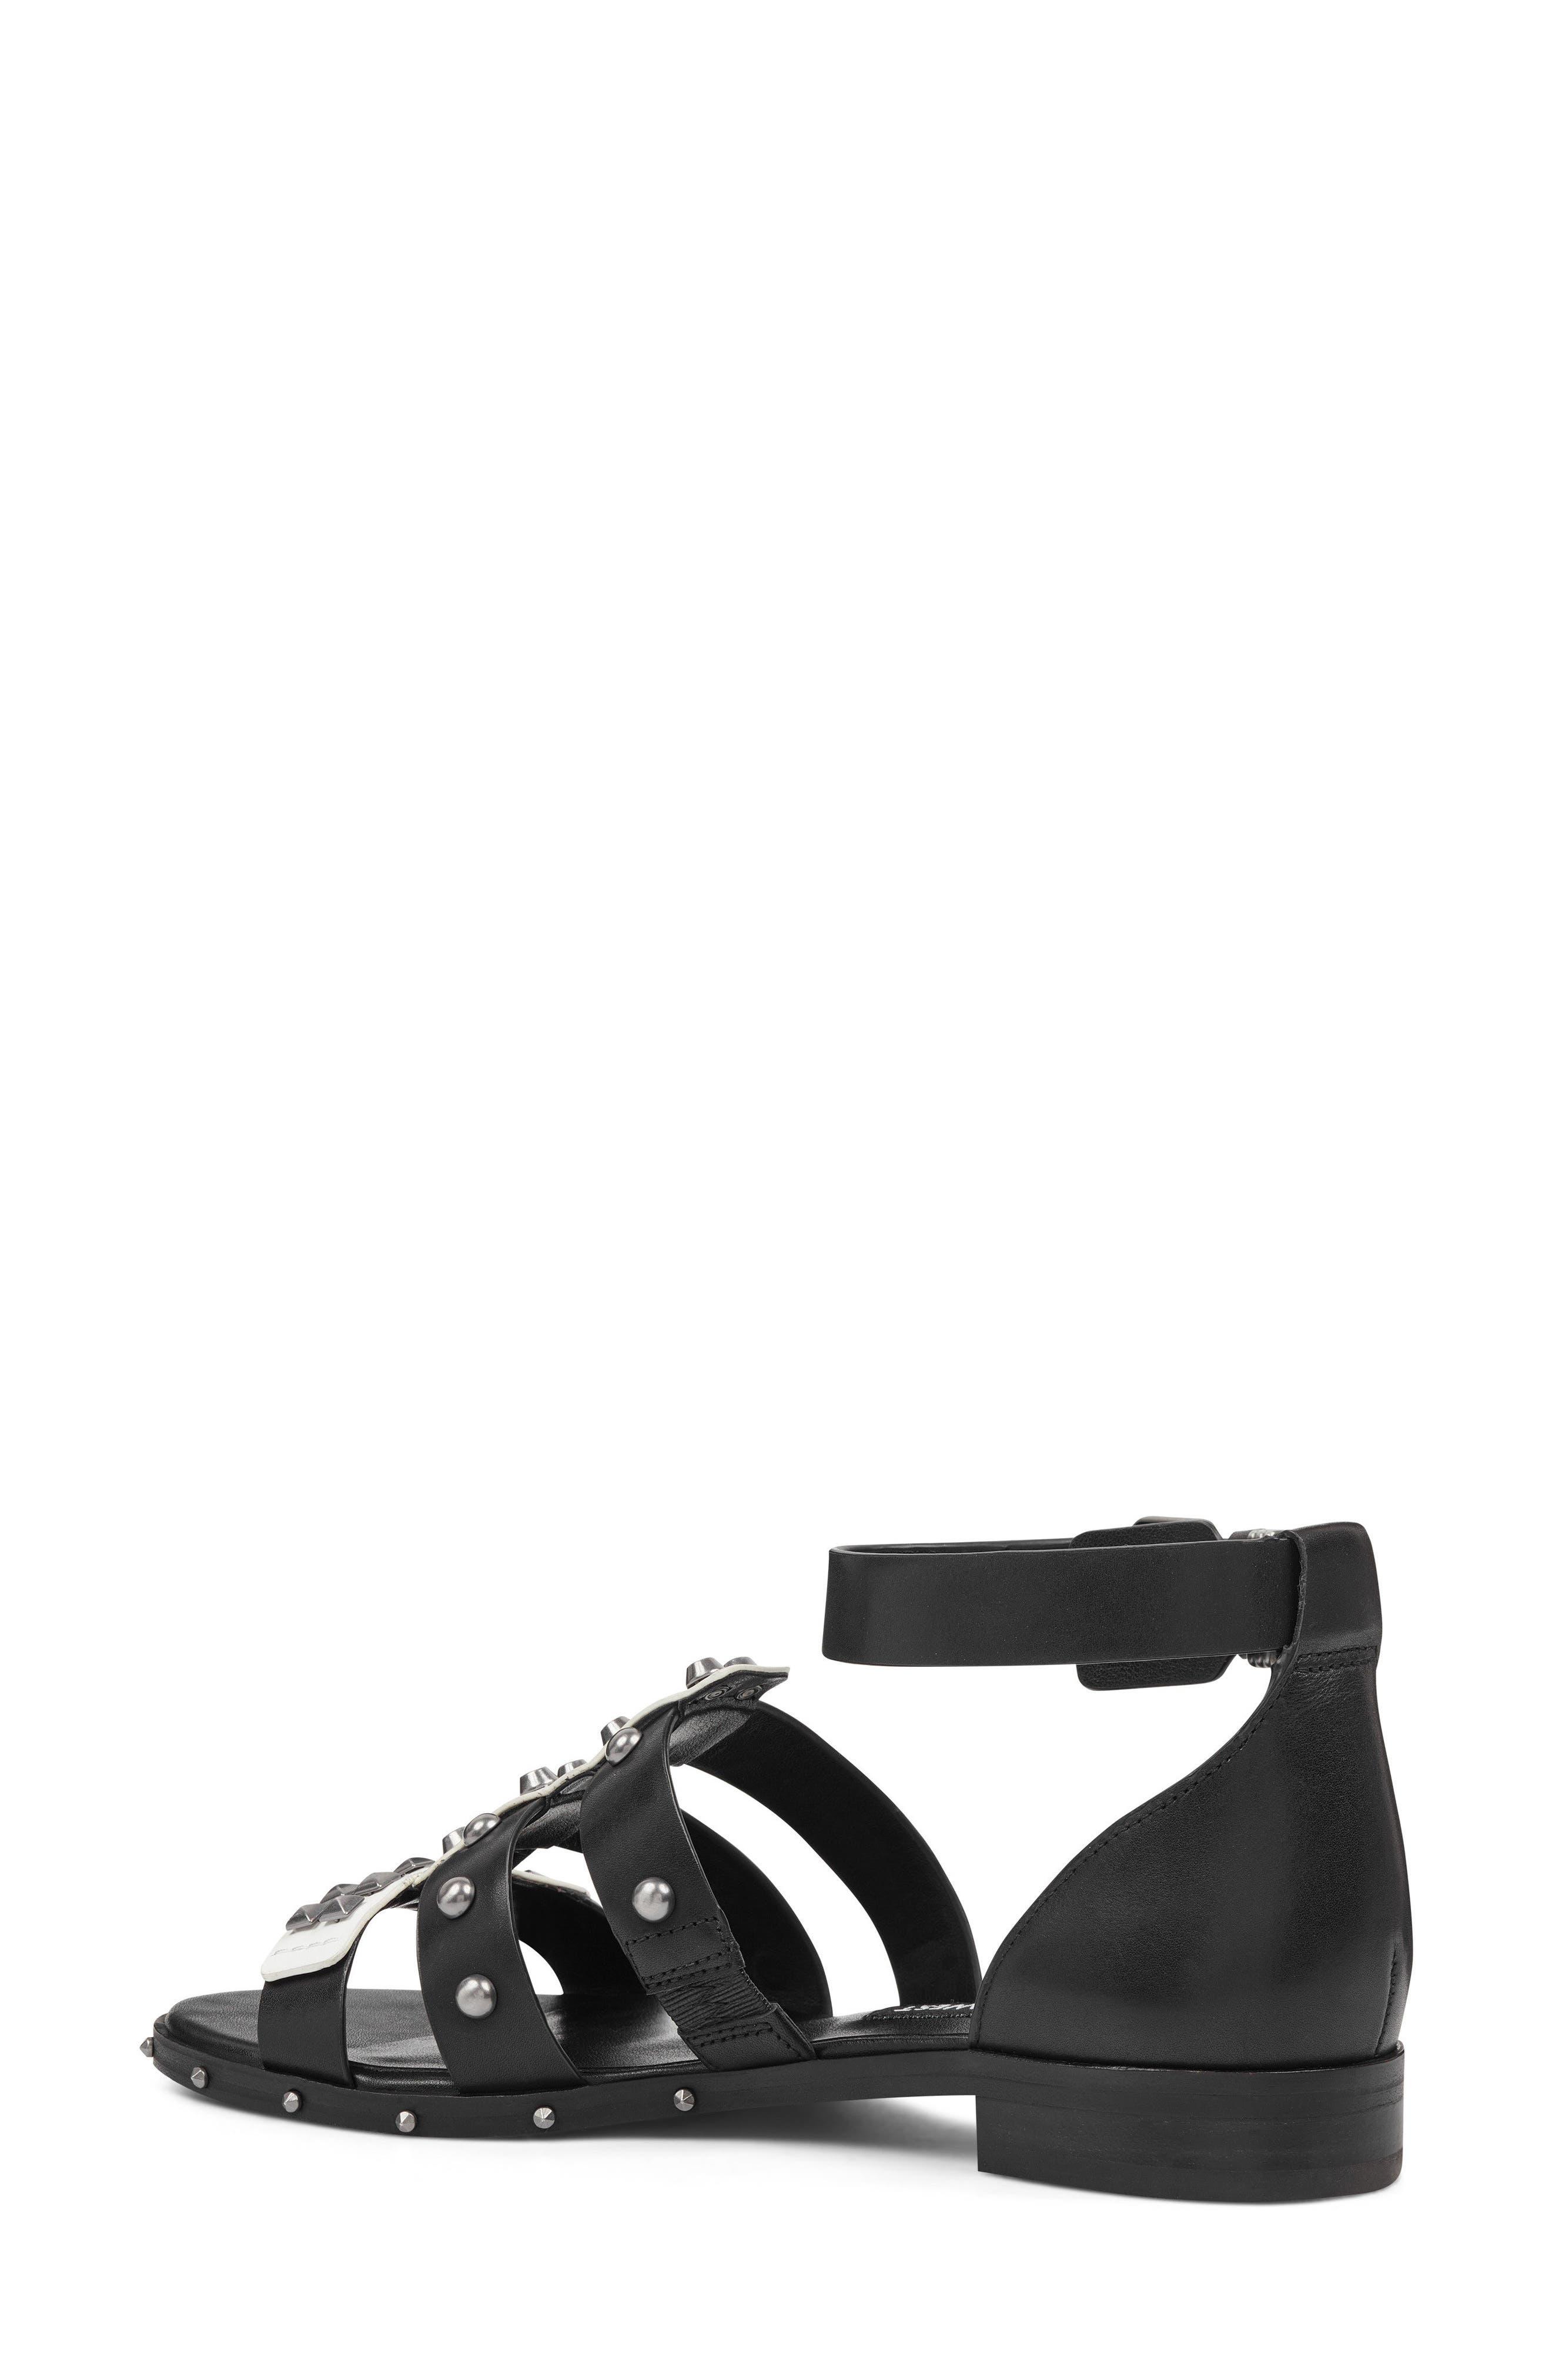 Corisande Sandal,                             Alternate thumbnail 2, color,                             White/ Black Leather